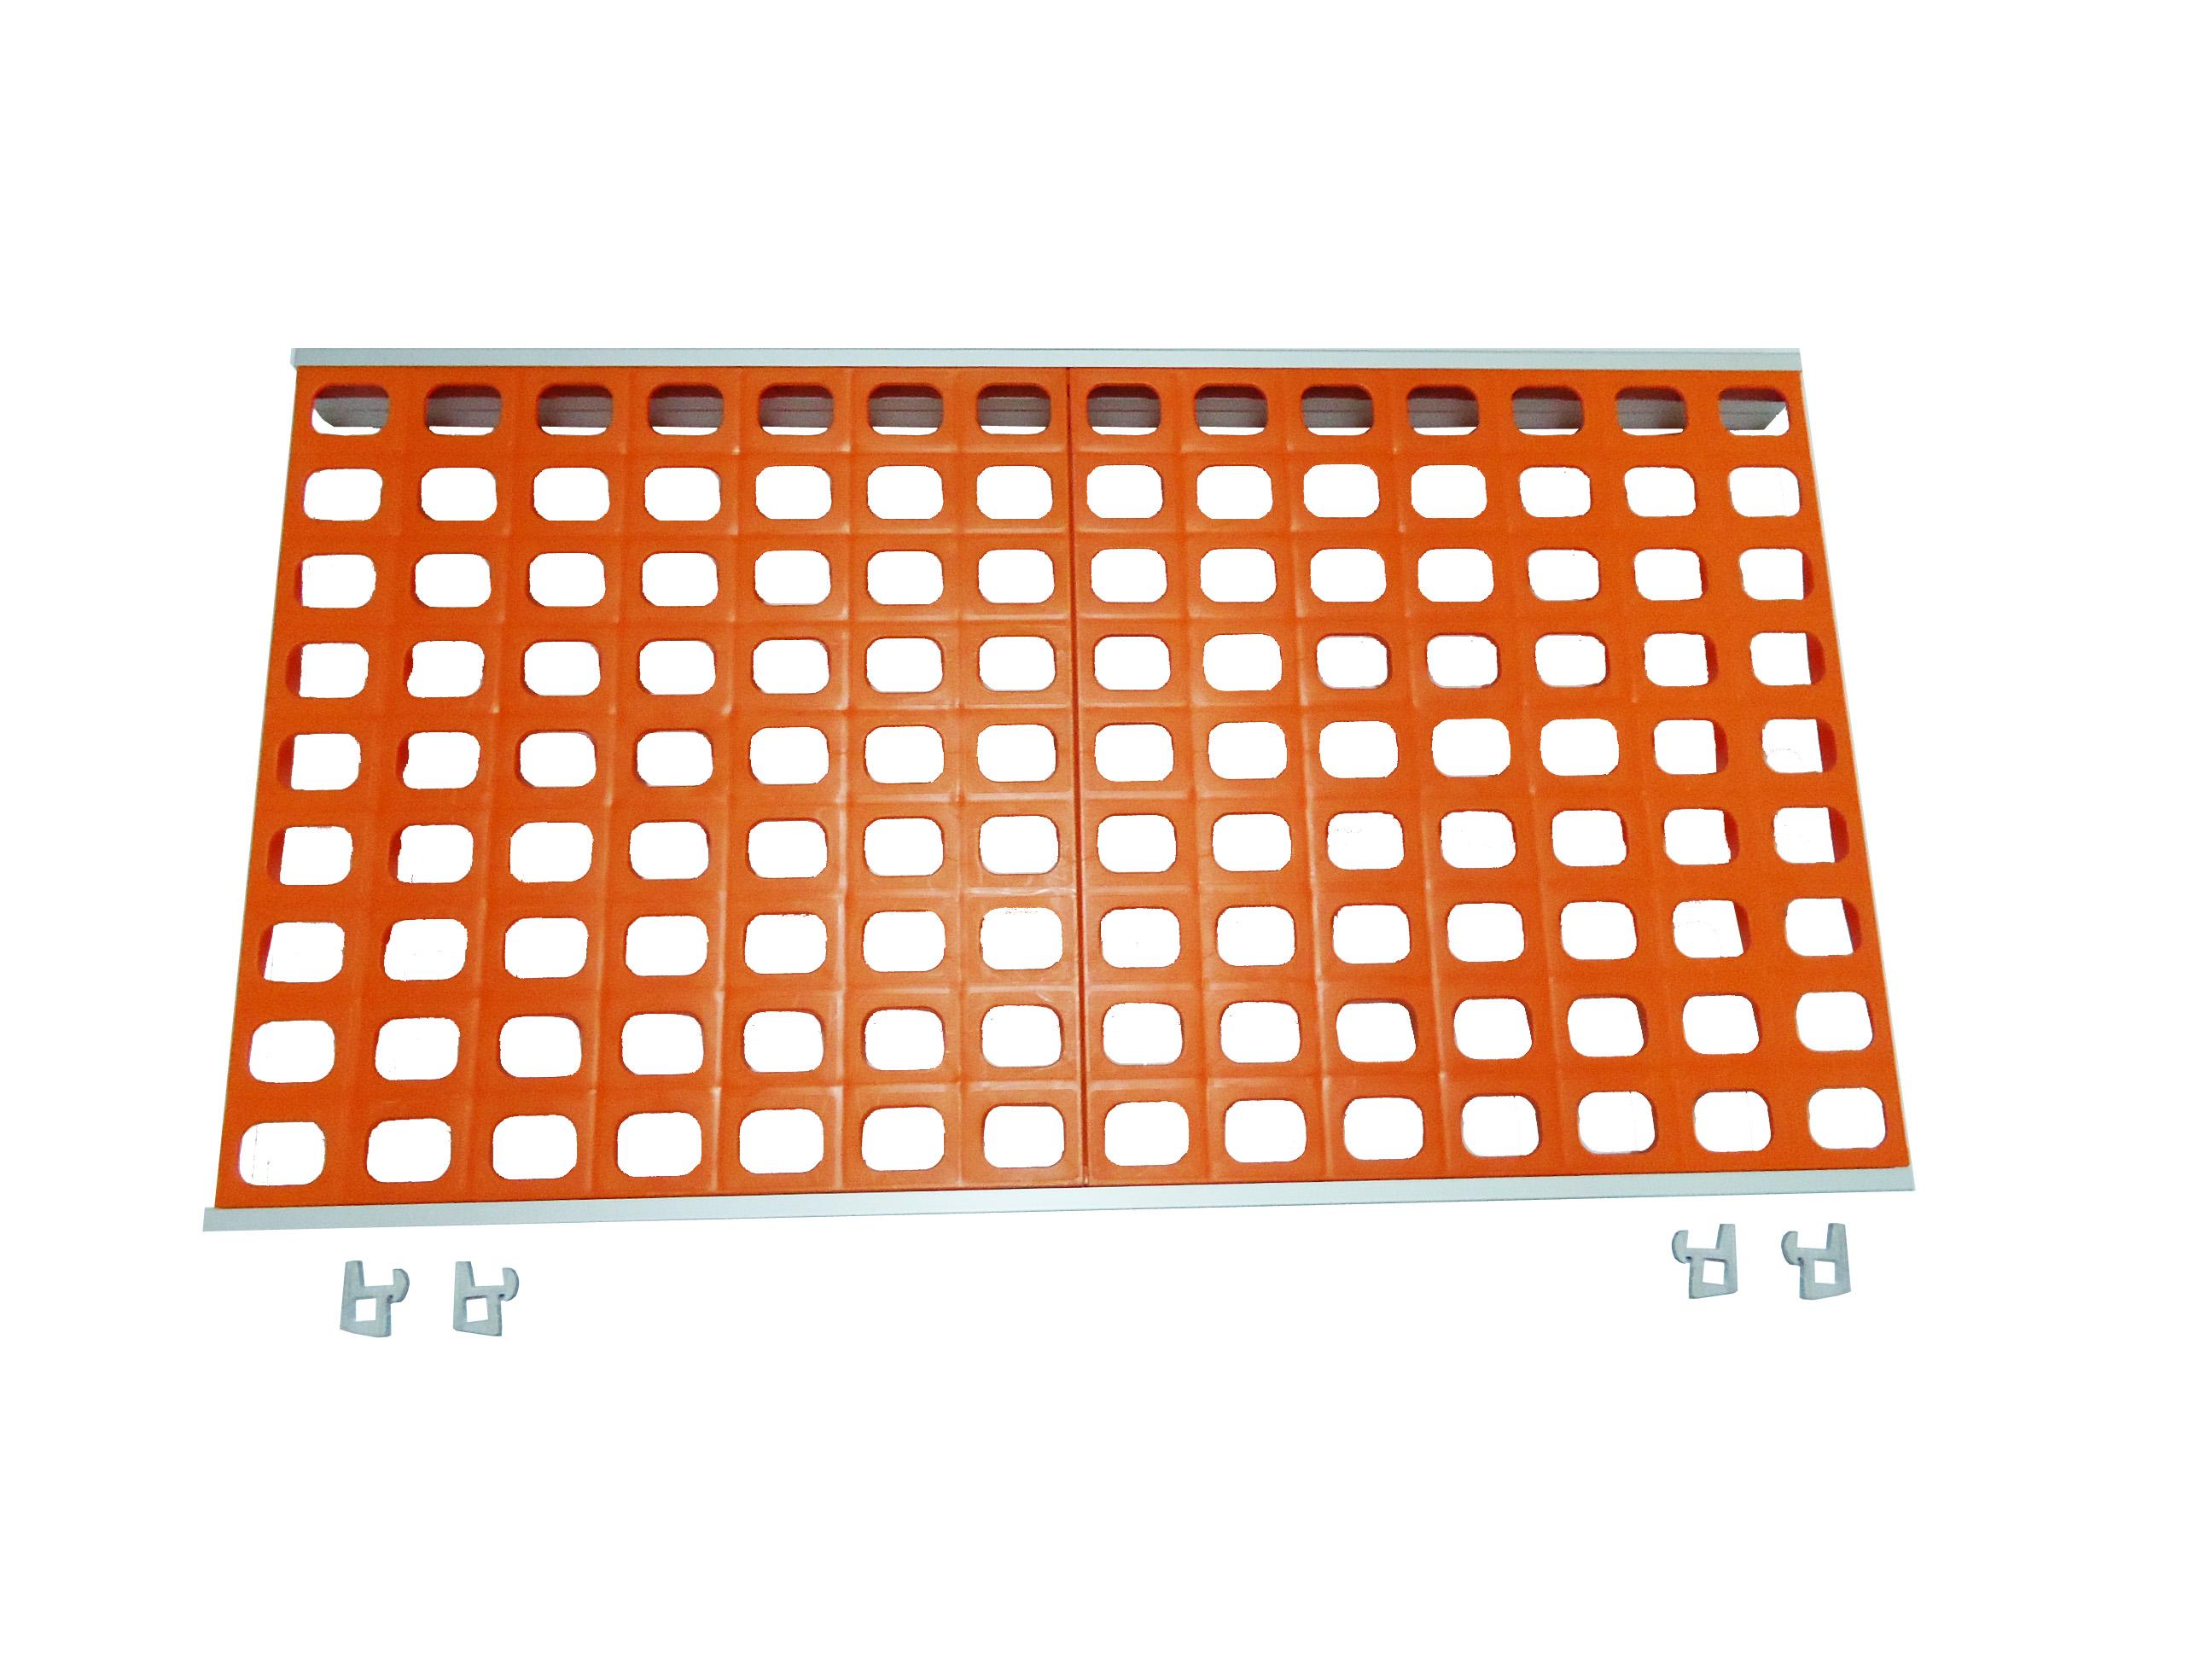 Coolblok KOPA47118C Ραφιέρα - Ράφι Ψυκτικών Θαλάμων Μονό Πολυαιθυλενίου - 1180x4 ψυκτικοί θάλαμοι    ράφια ψυκτικών θαλάμων  ψυκτικοί θάλαμοι    ράφια ψυκτικών θ